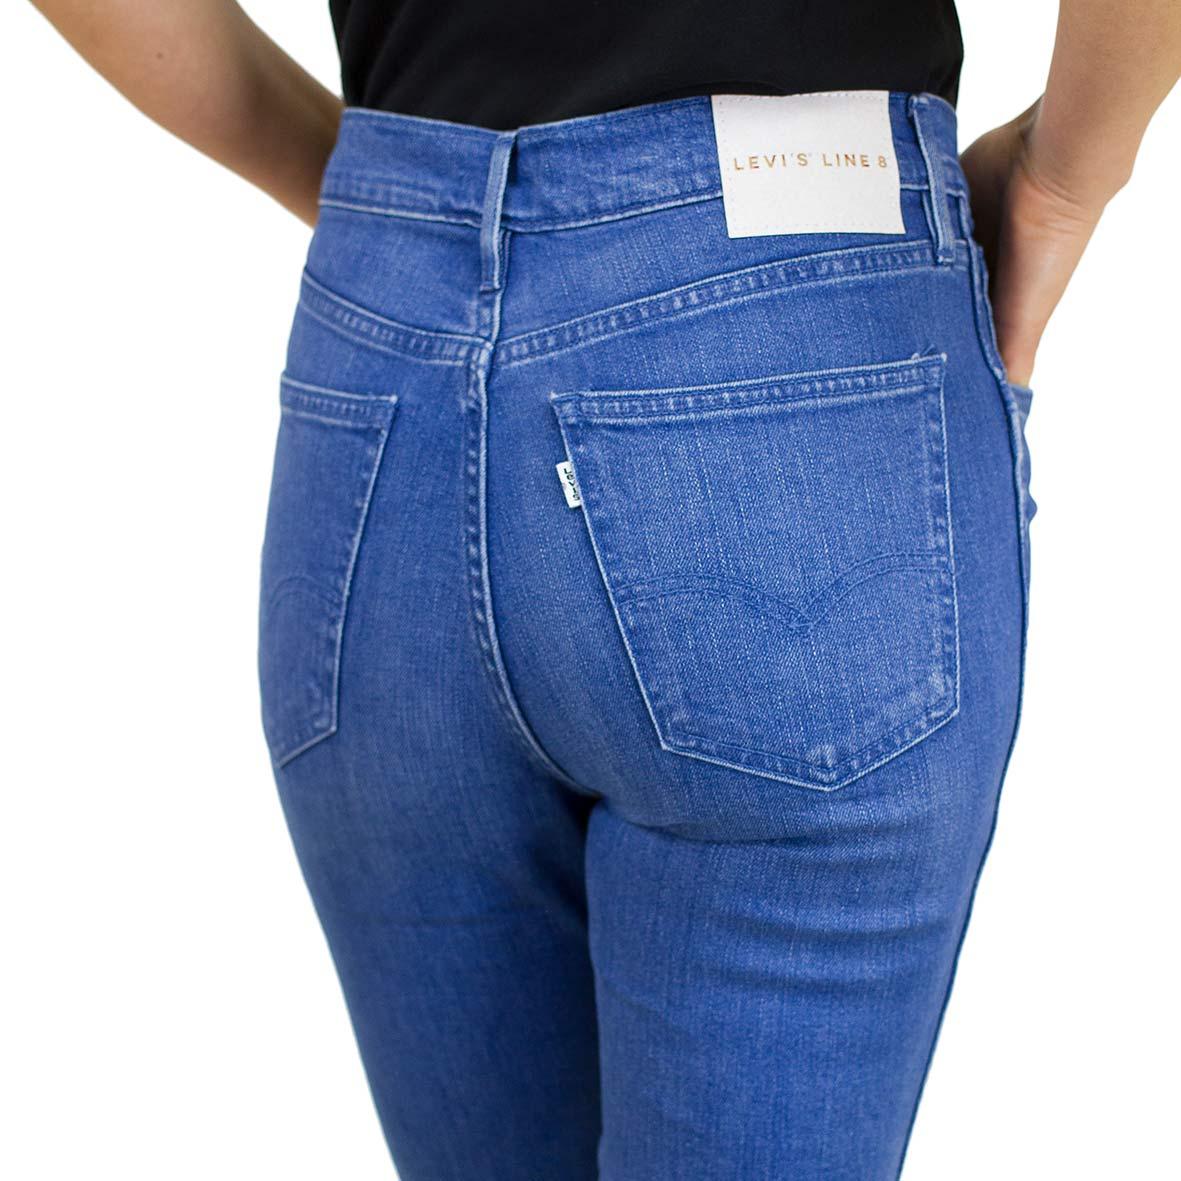 buy popular 69362 5352f Levis Damen Jeans L8 High Skinny Surf blau